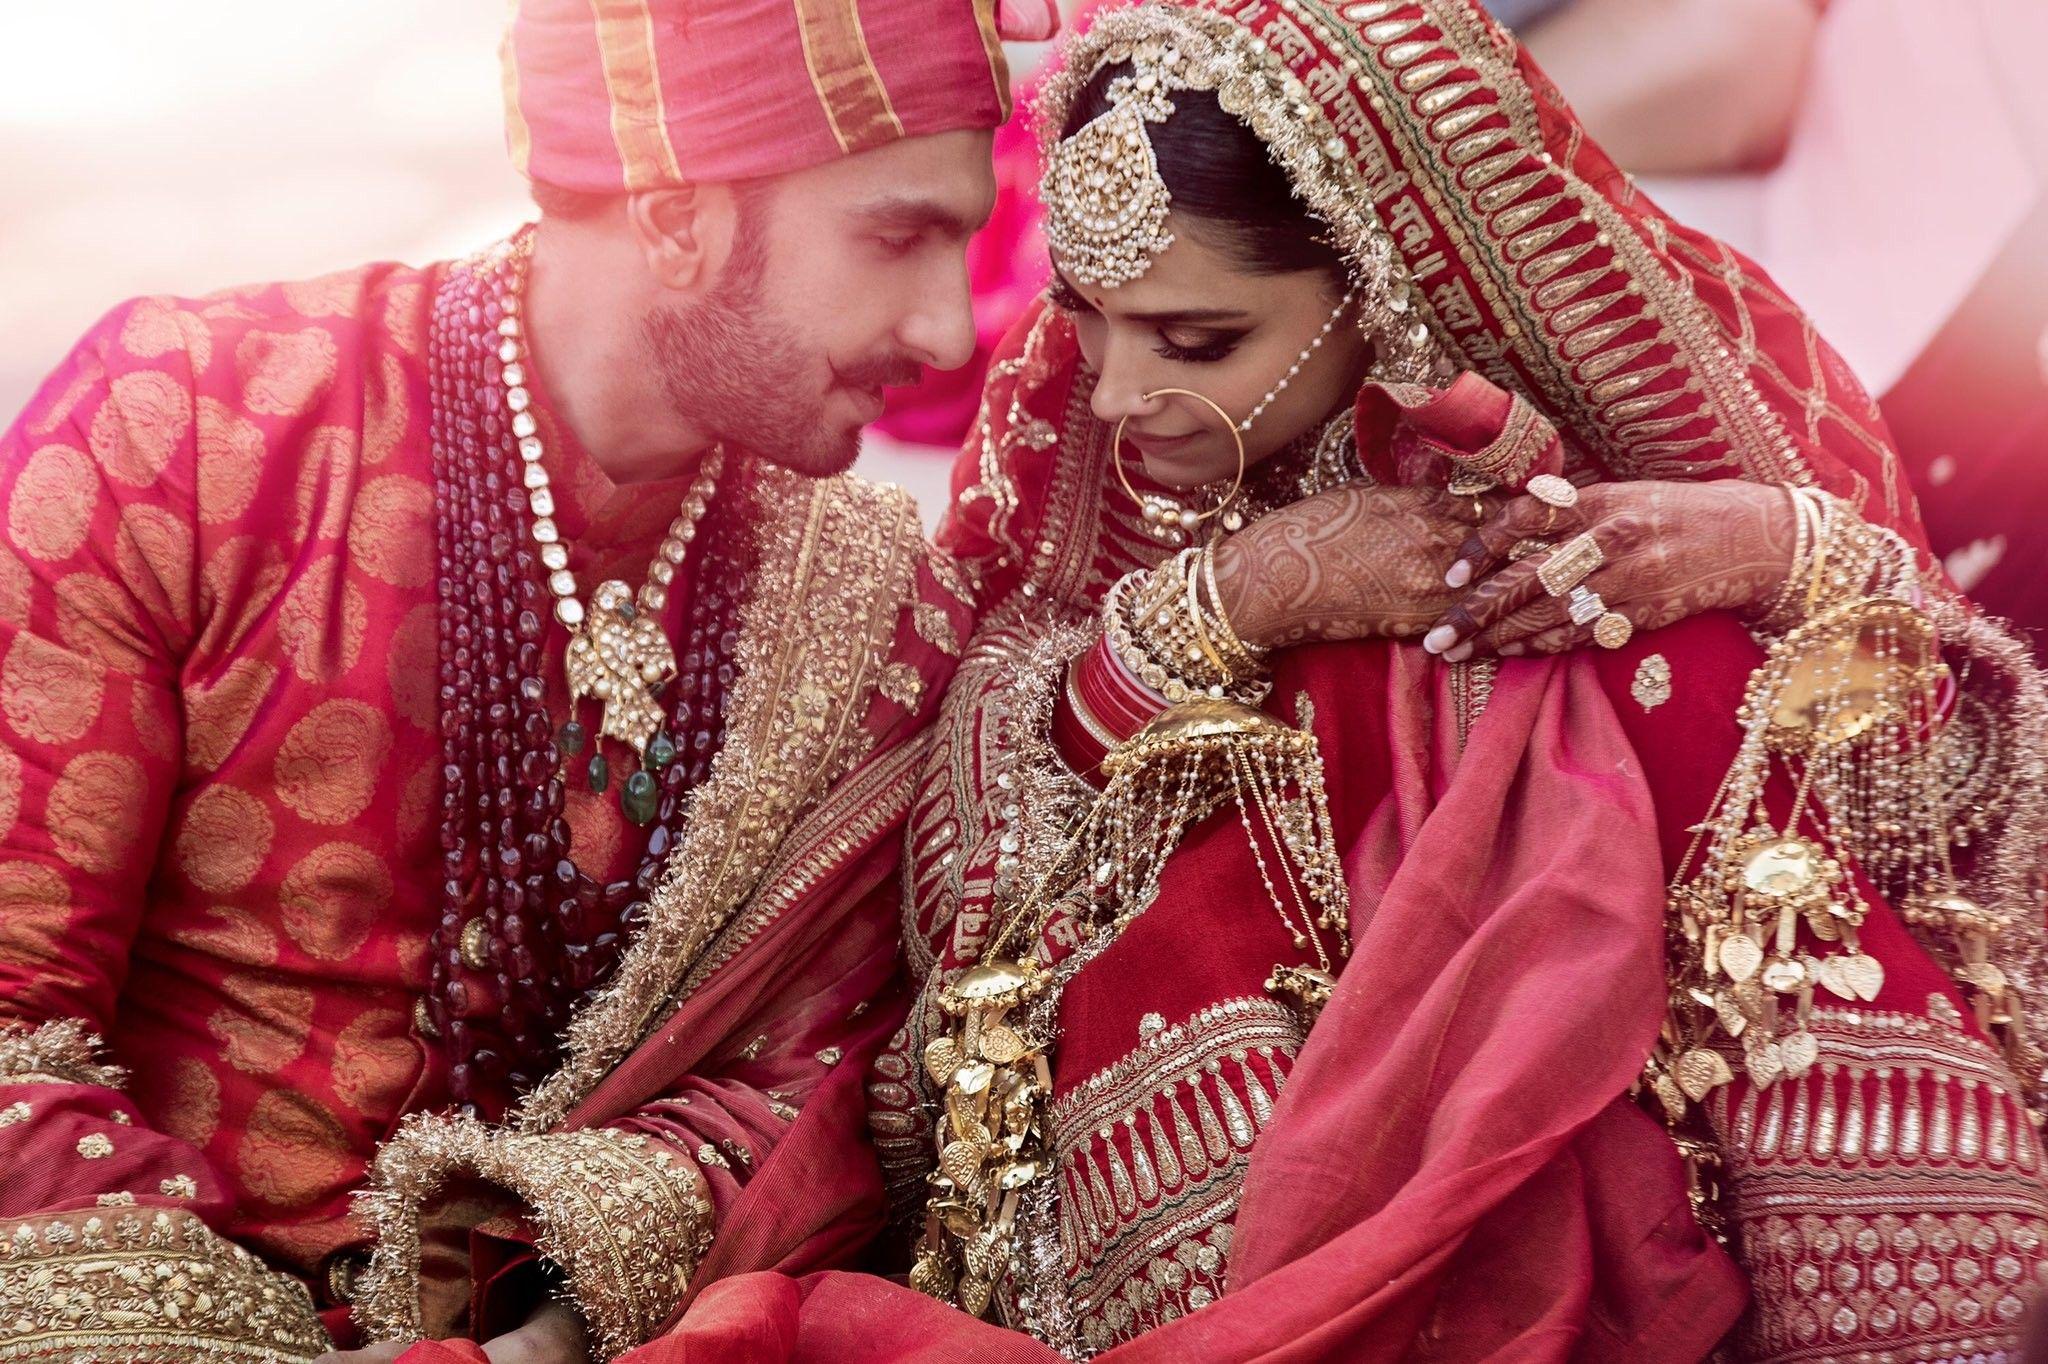 Deepika And Renveer Singh Wedding Pics Deepveerkishaadi Deepika Ranveer Deepikapadukone Ranve Bollywood Wedding Deepika Ranveer Indian Wedding Photography